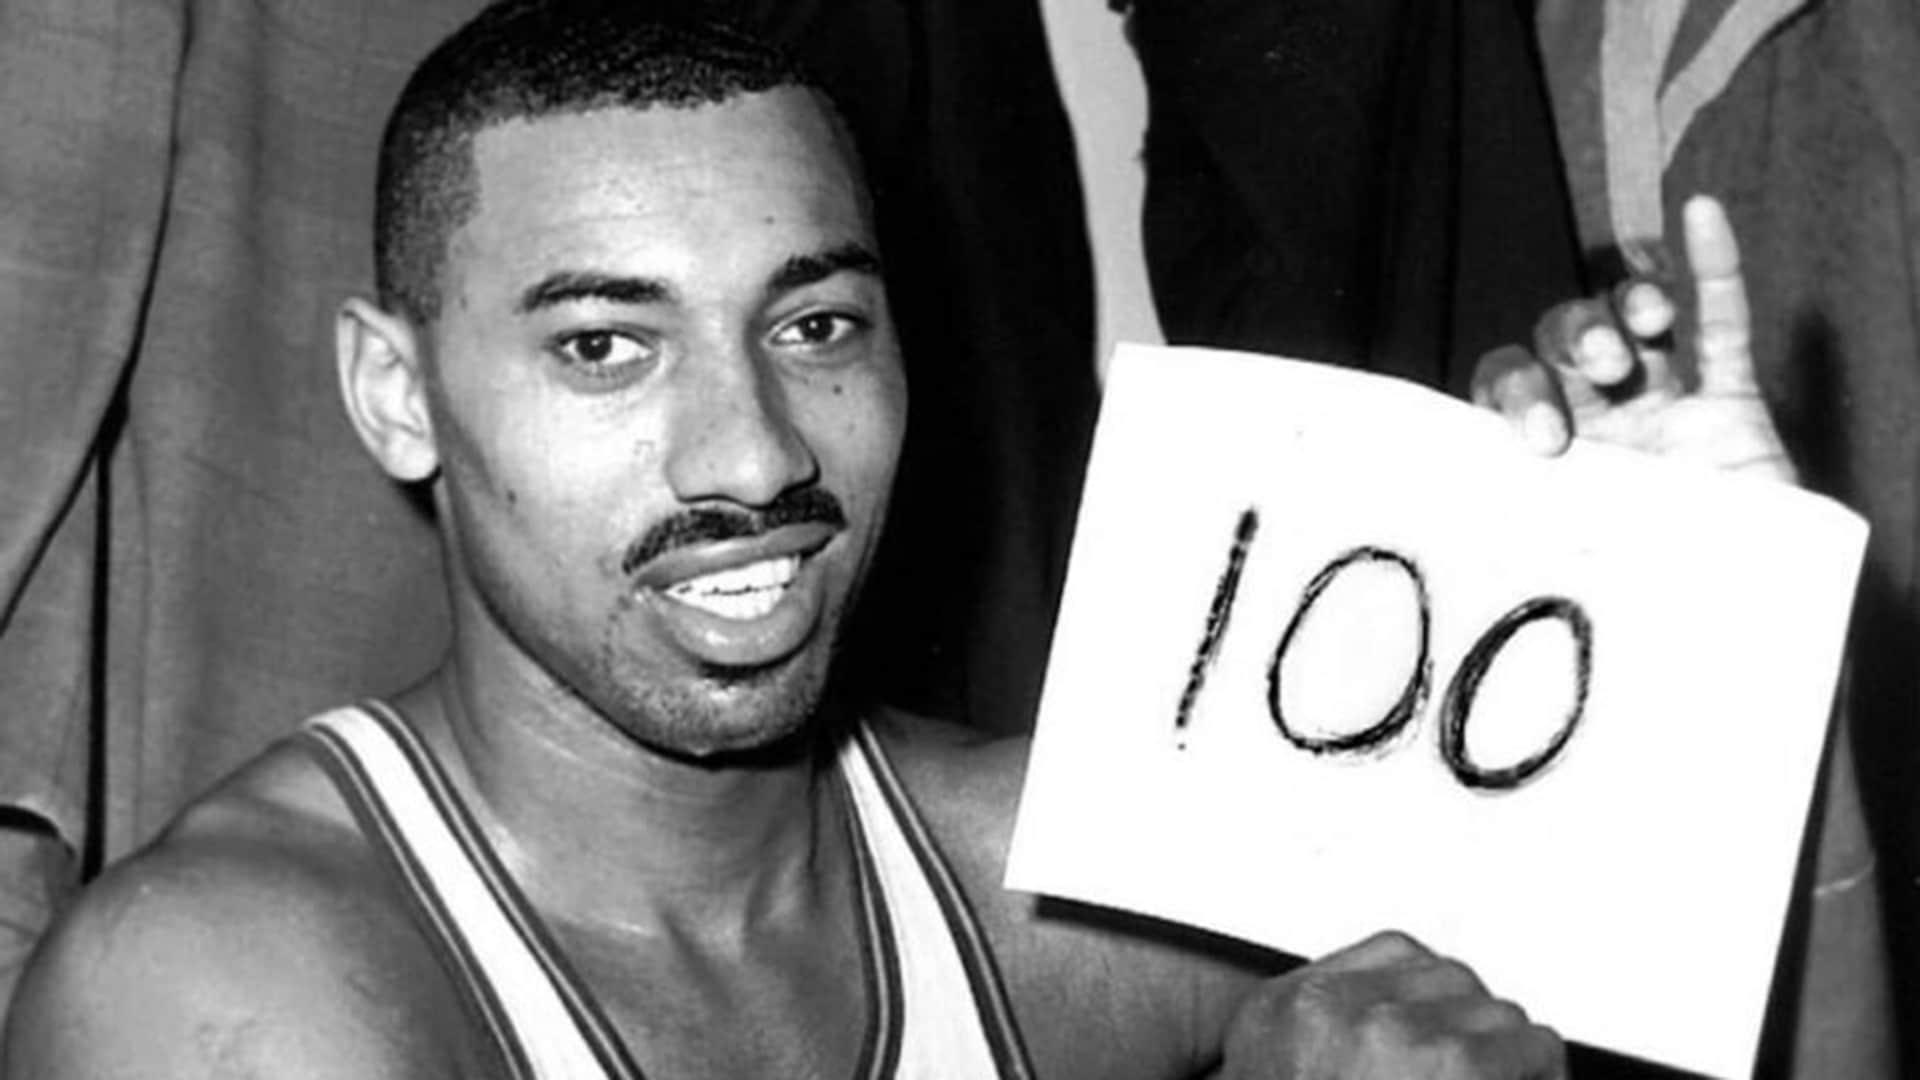 Top Moments: Wilt Chamberlain scores 100 in 1962 game vs. Knicks